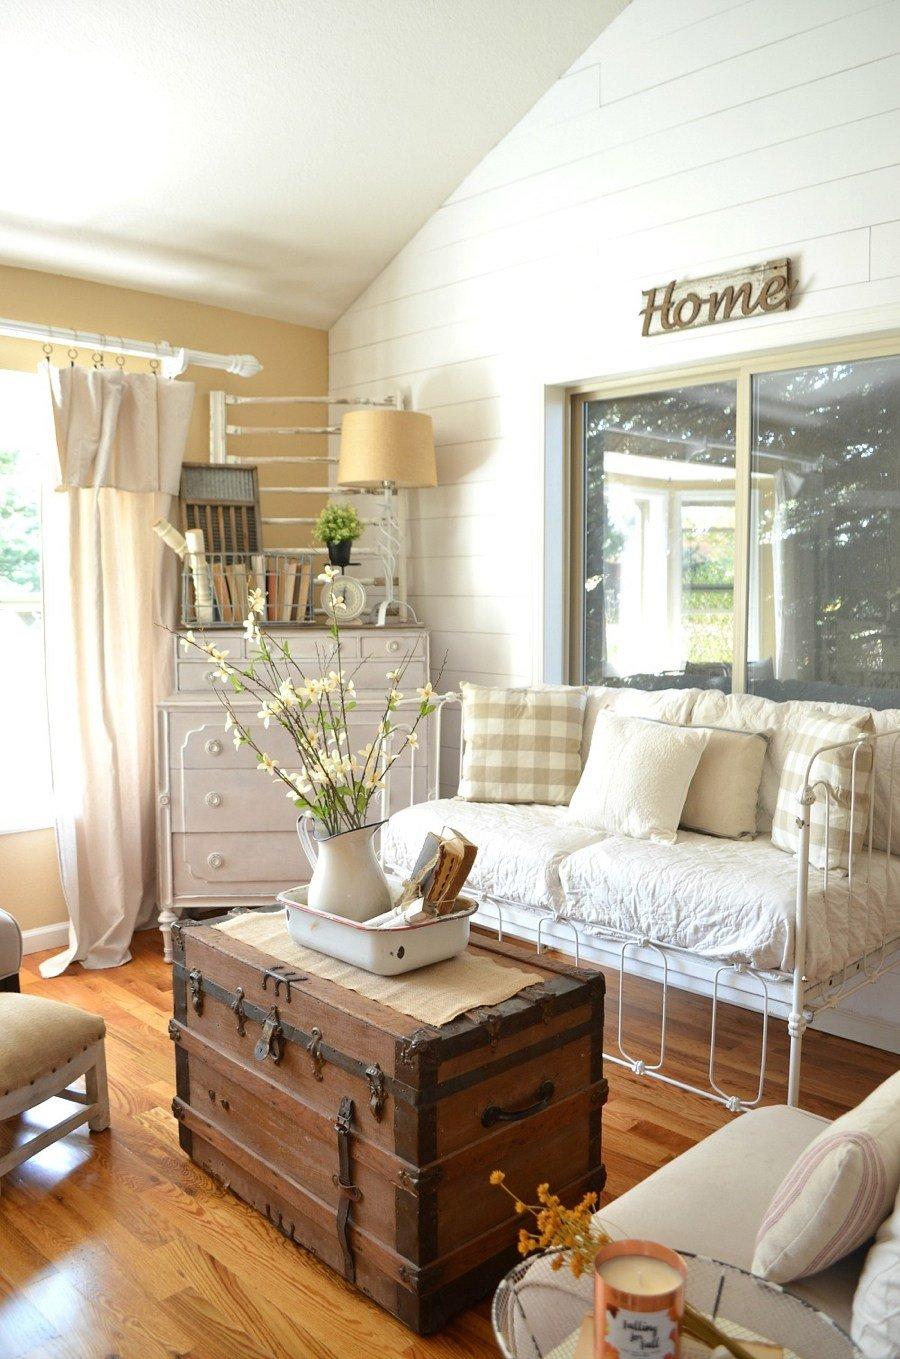 Small Farmhouse Living Room Ideas 27 Rustic Farmhouse Living Room Decor Ideas for Your Home